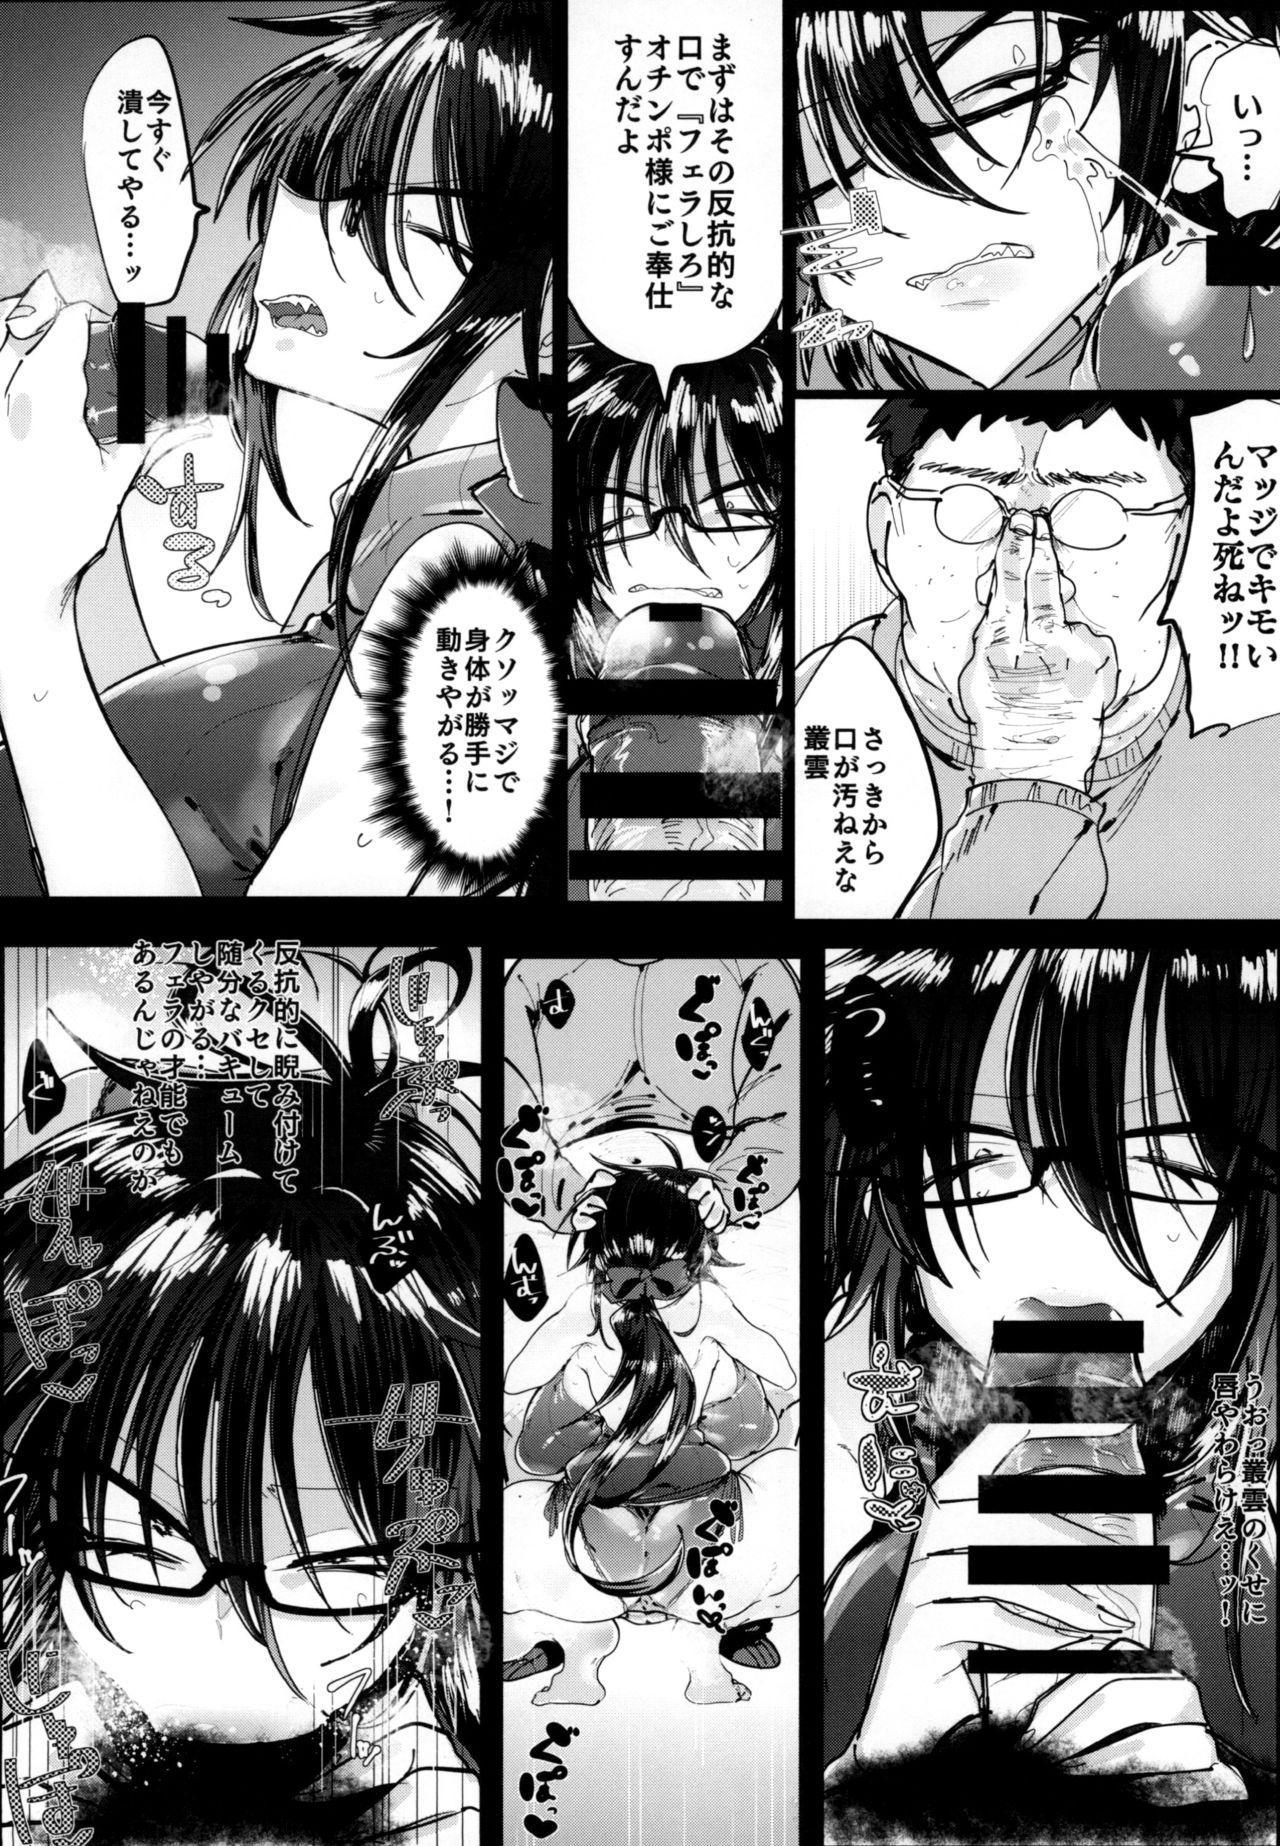 Kurokami Sanpakugan Megane Danshi TS Kyousei Fukujuu Fuck 7